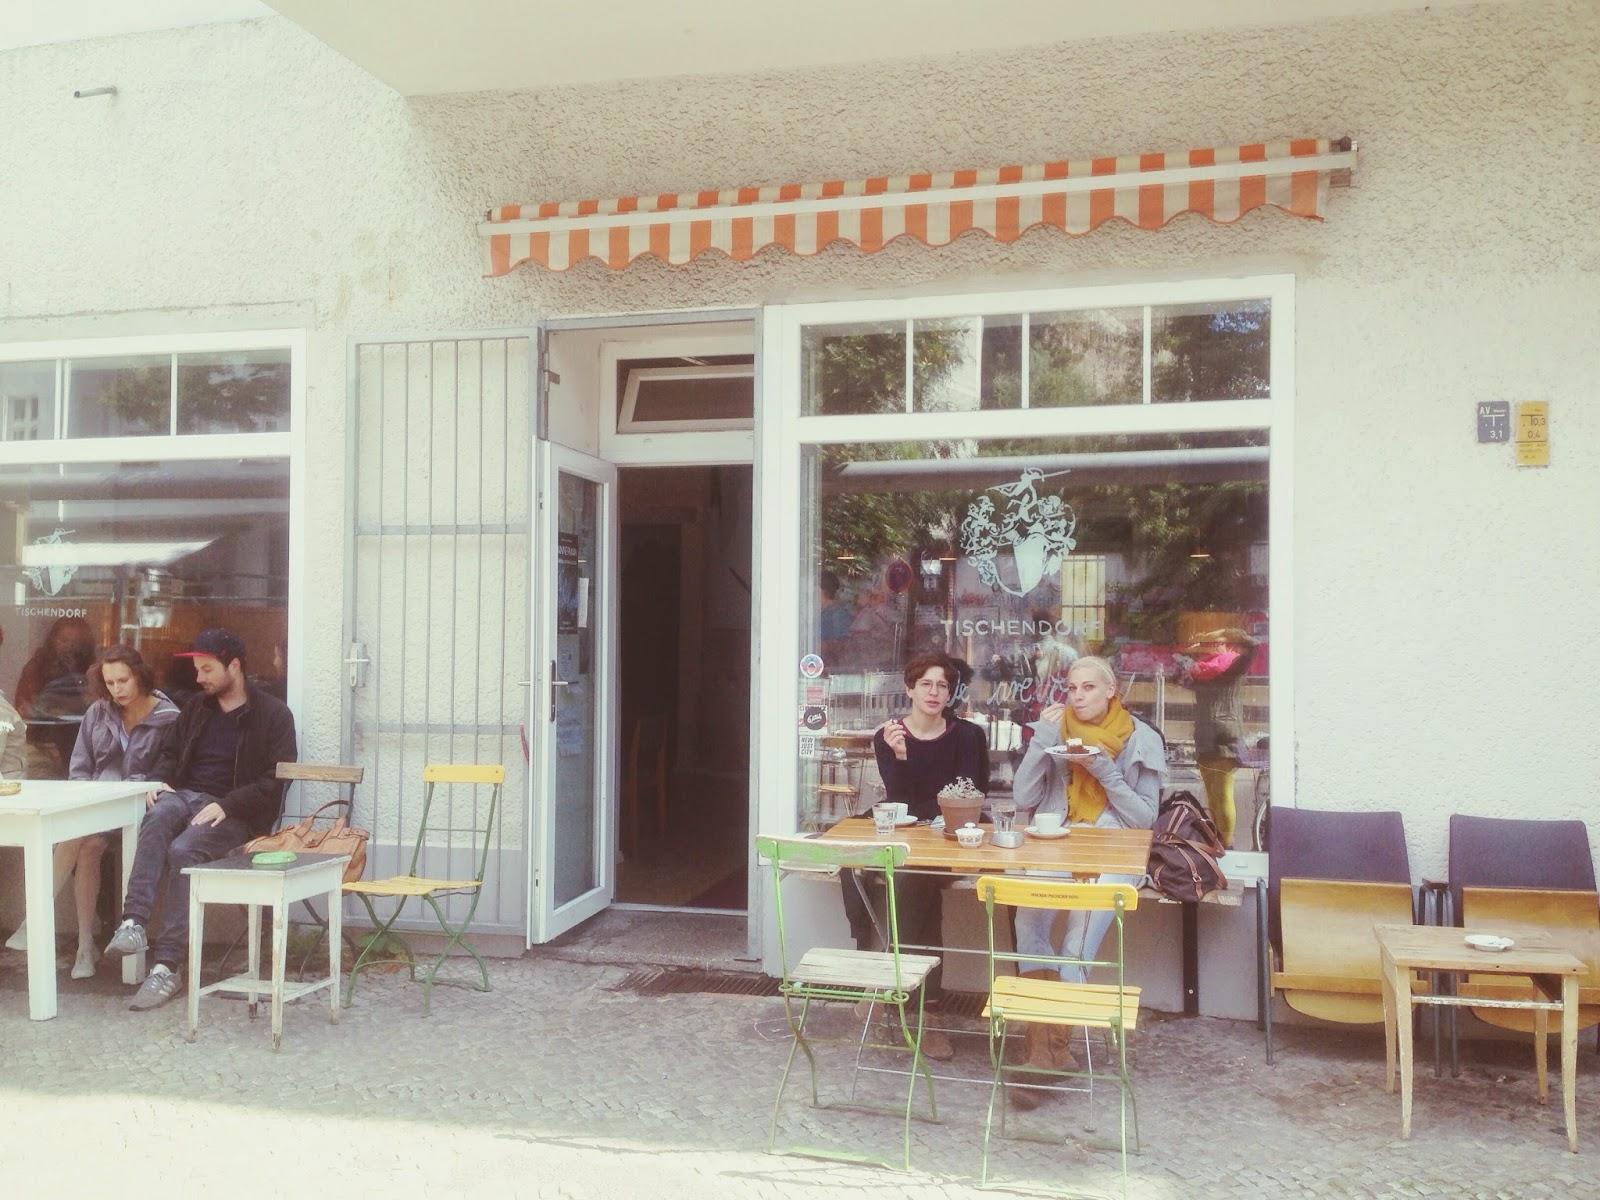 TISCHENDORF BERLIN